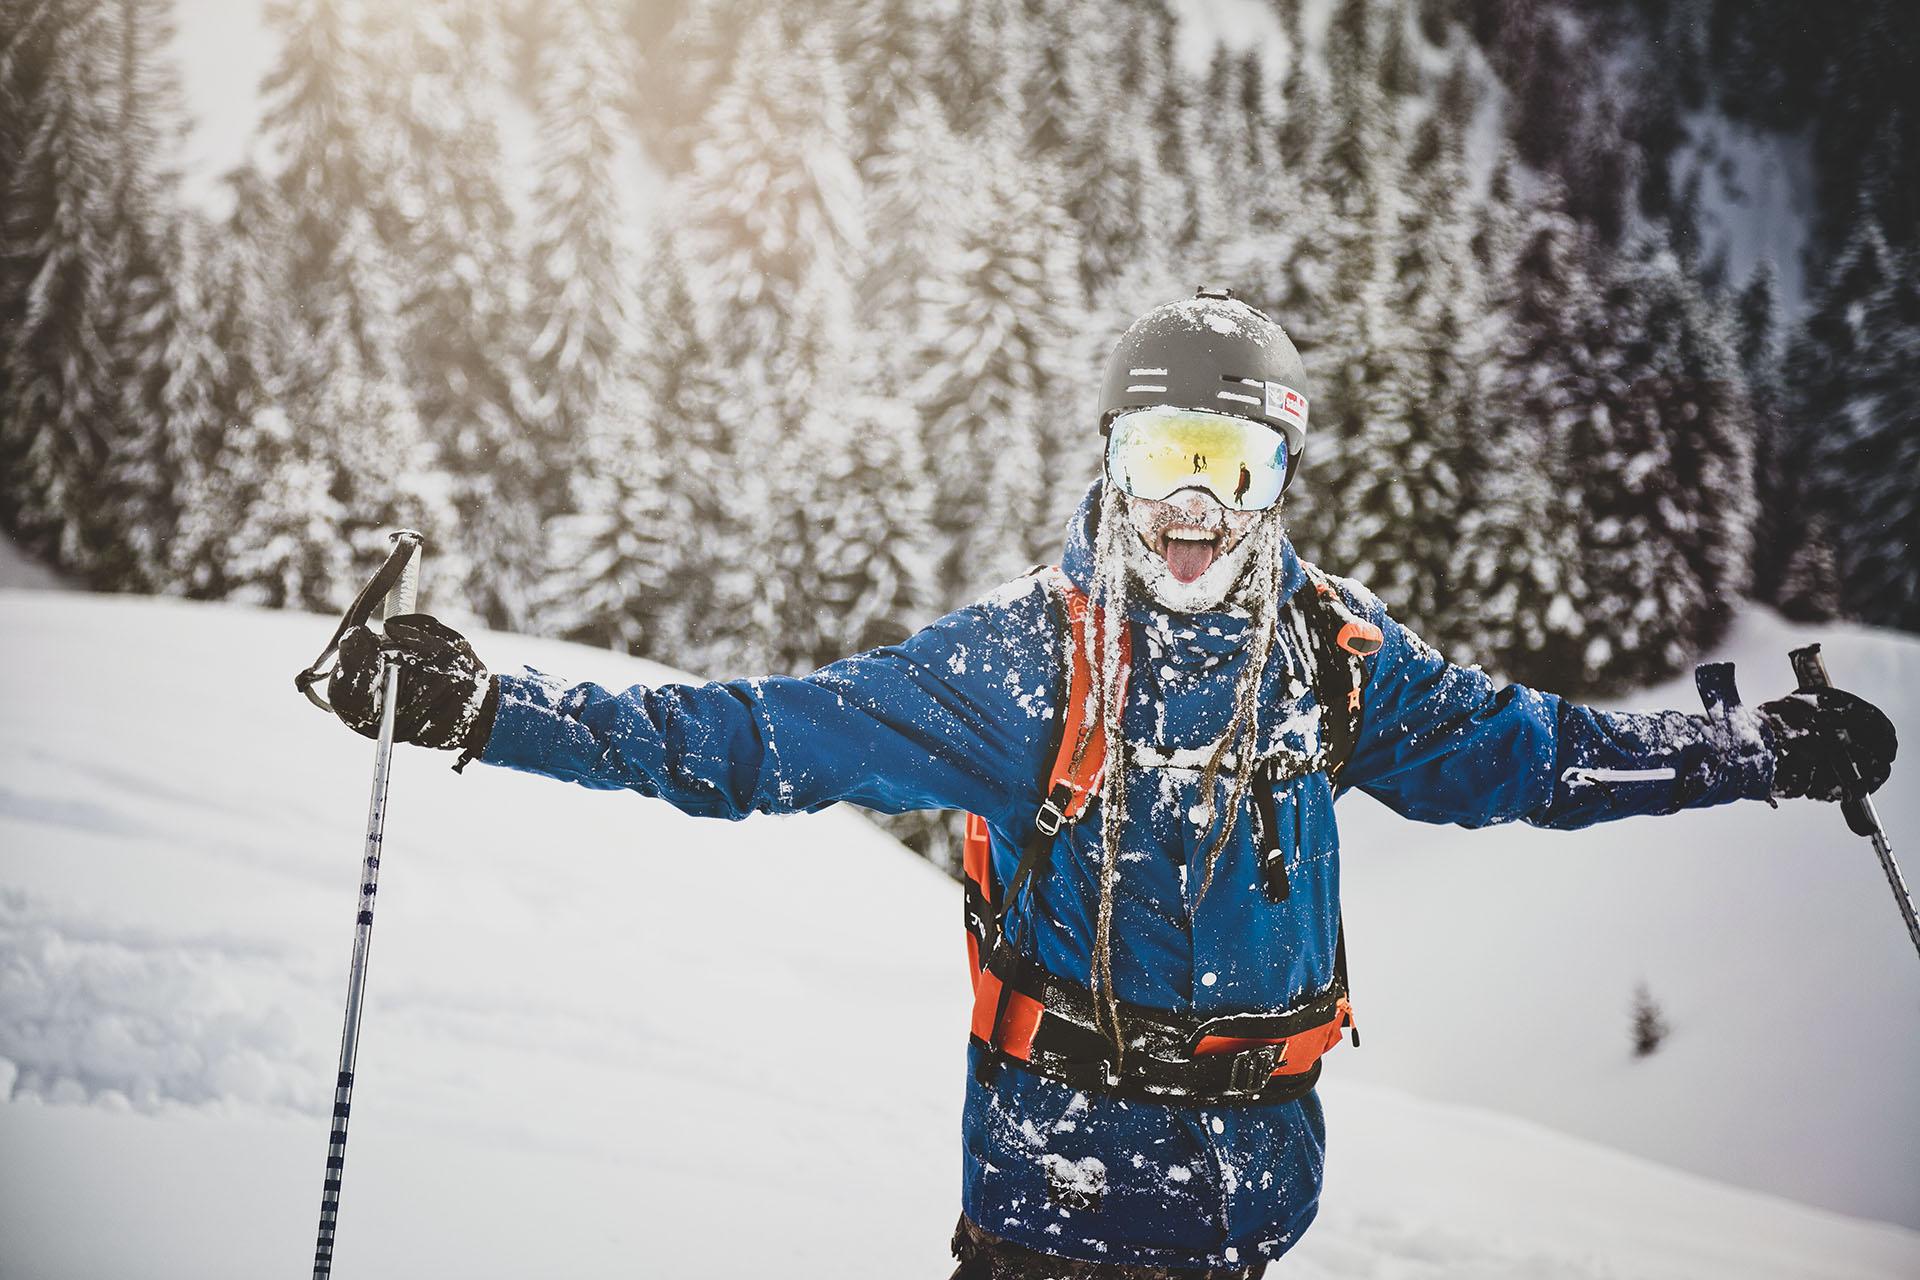 HolidayFlats24-Skifahren-Freeride-Home-of-Laessig